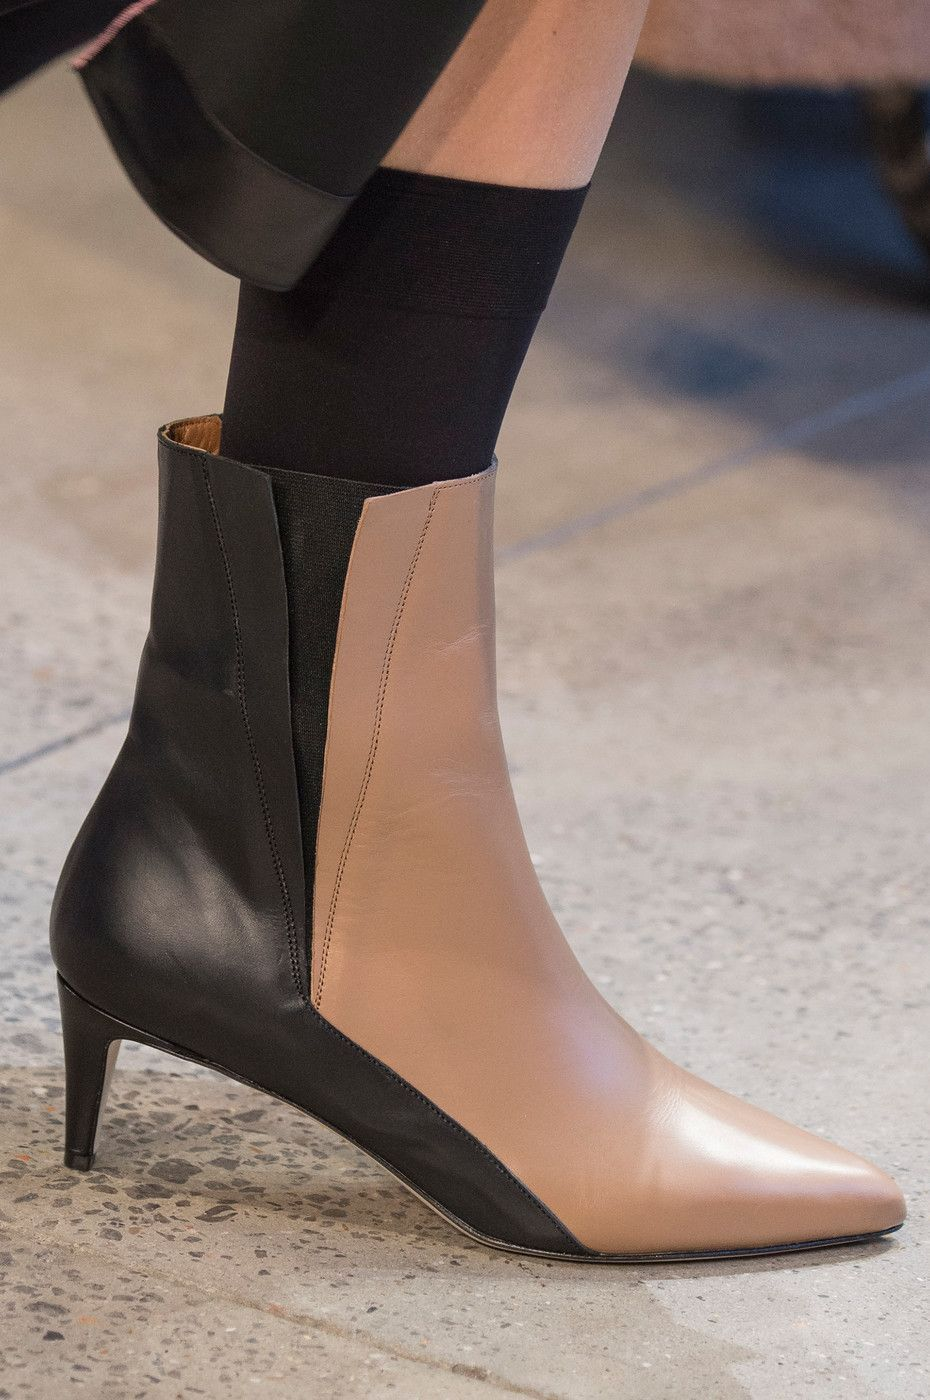 1f795d3bf Sandalias, Zapatillas, Bolsas, Botas Dama, Estilo Juvenil, Calzado Mujer,  Zapatos